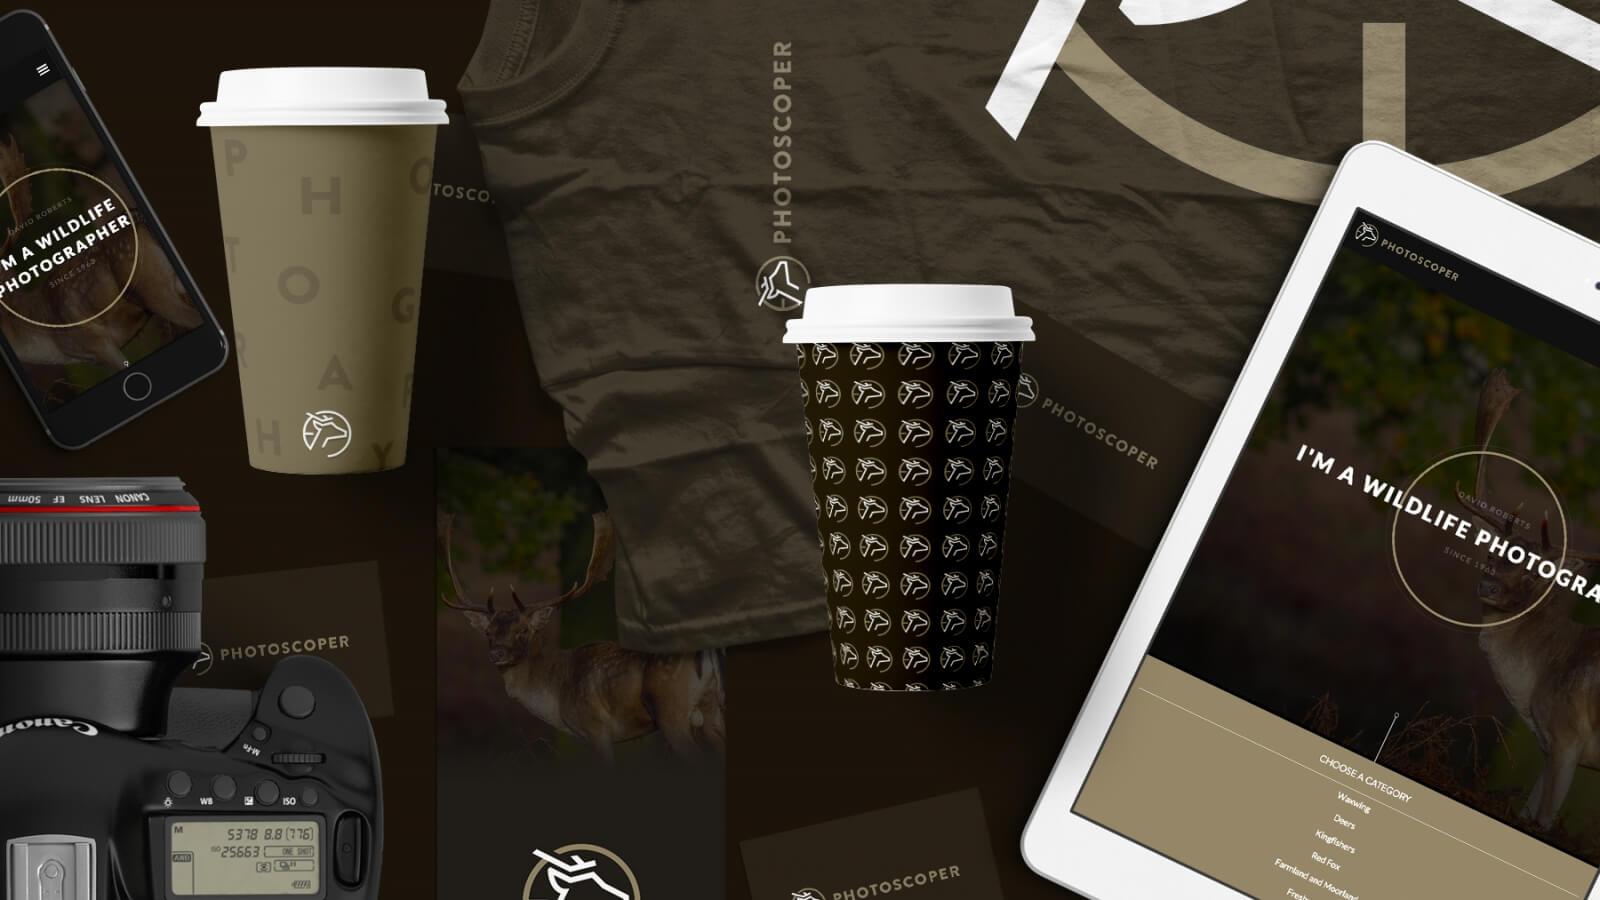 Photoscoper branding, identity and print